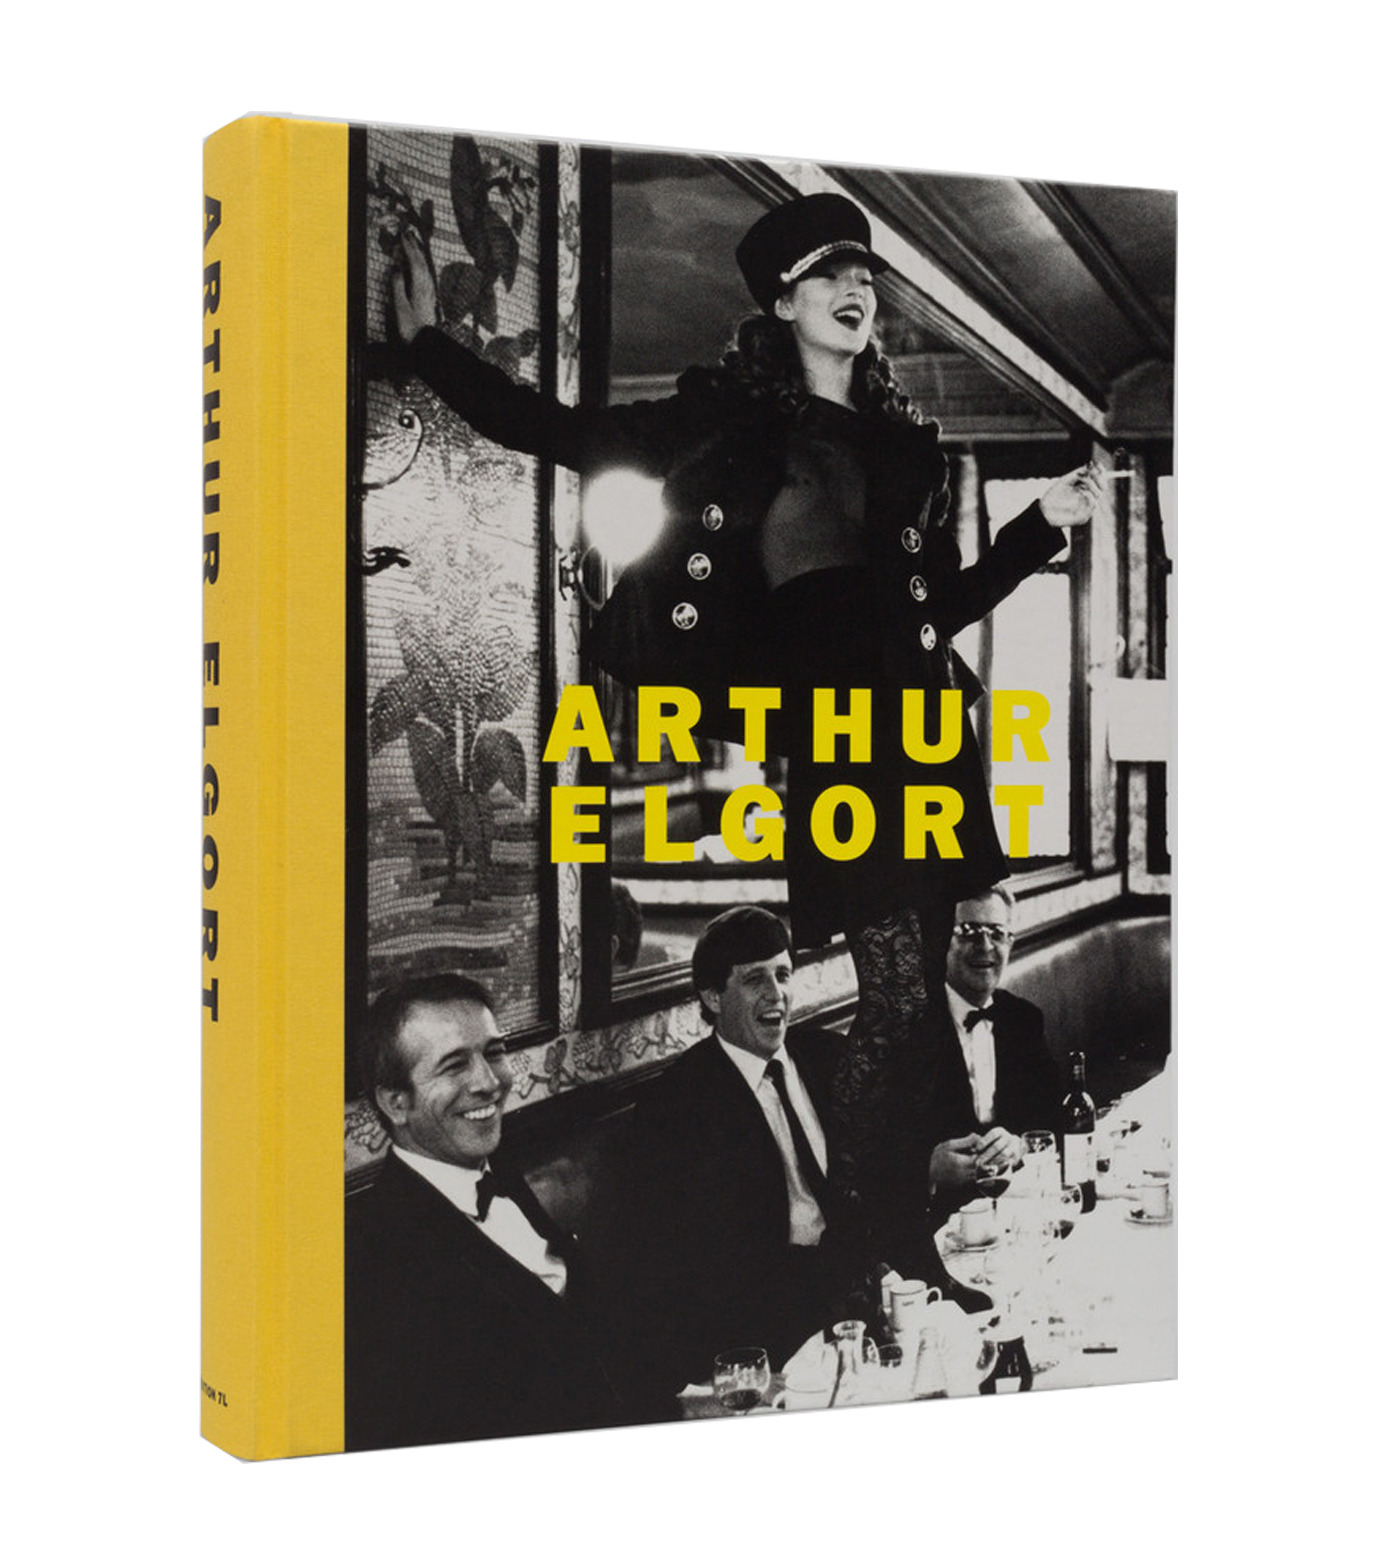 ArtBook(アートブック)のArthur Elgort:The Big Picture.-GRAY(インテリア/OTHER-GOODS/interior/OTHER-GOODS)-86930-543-1-11 拡大詳細画像1